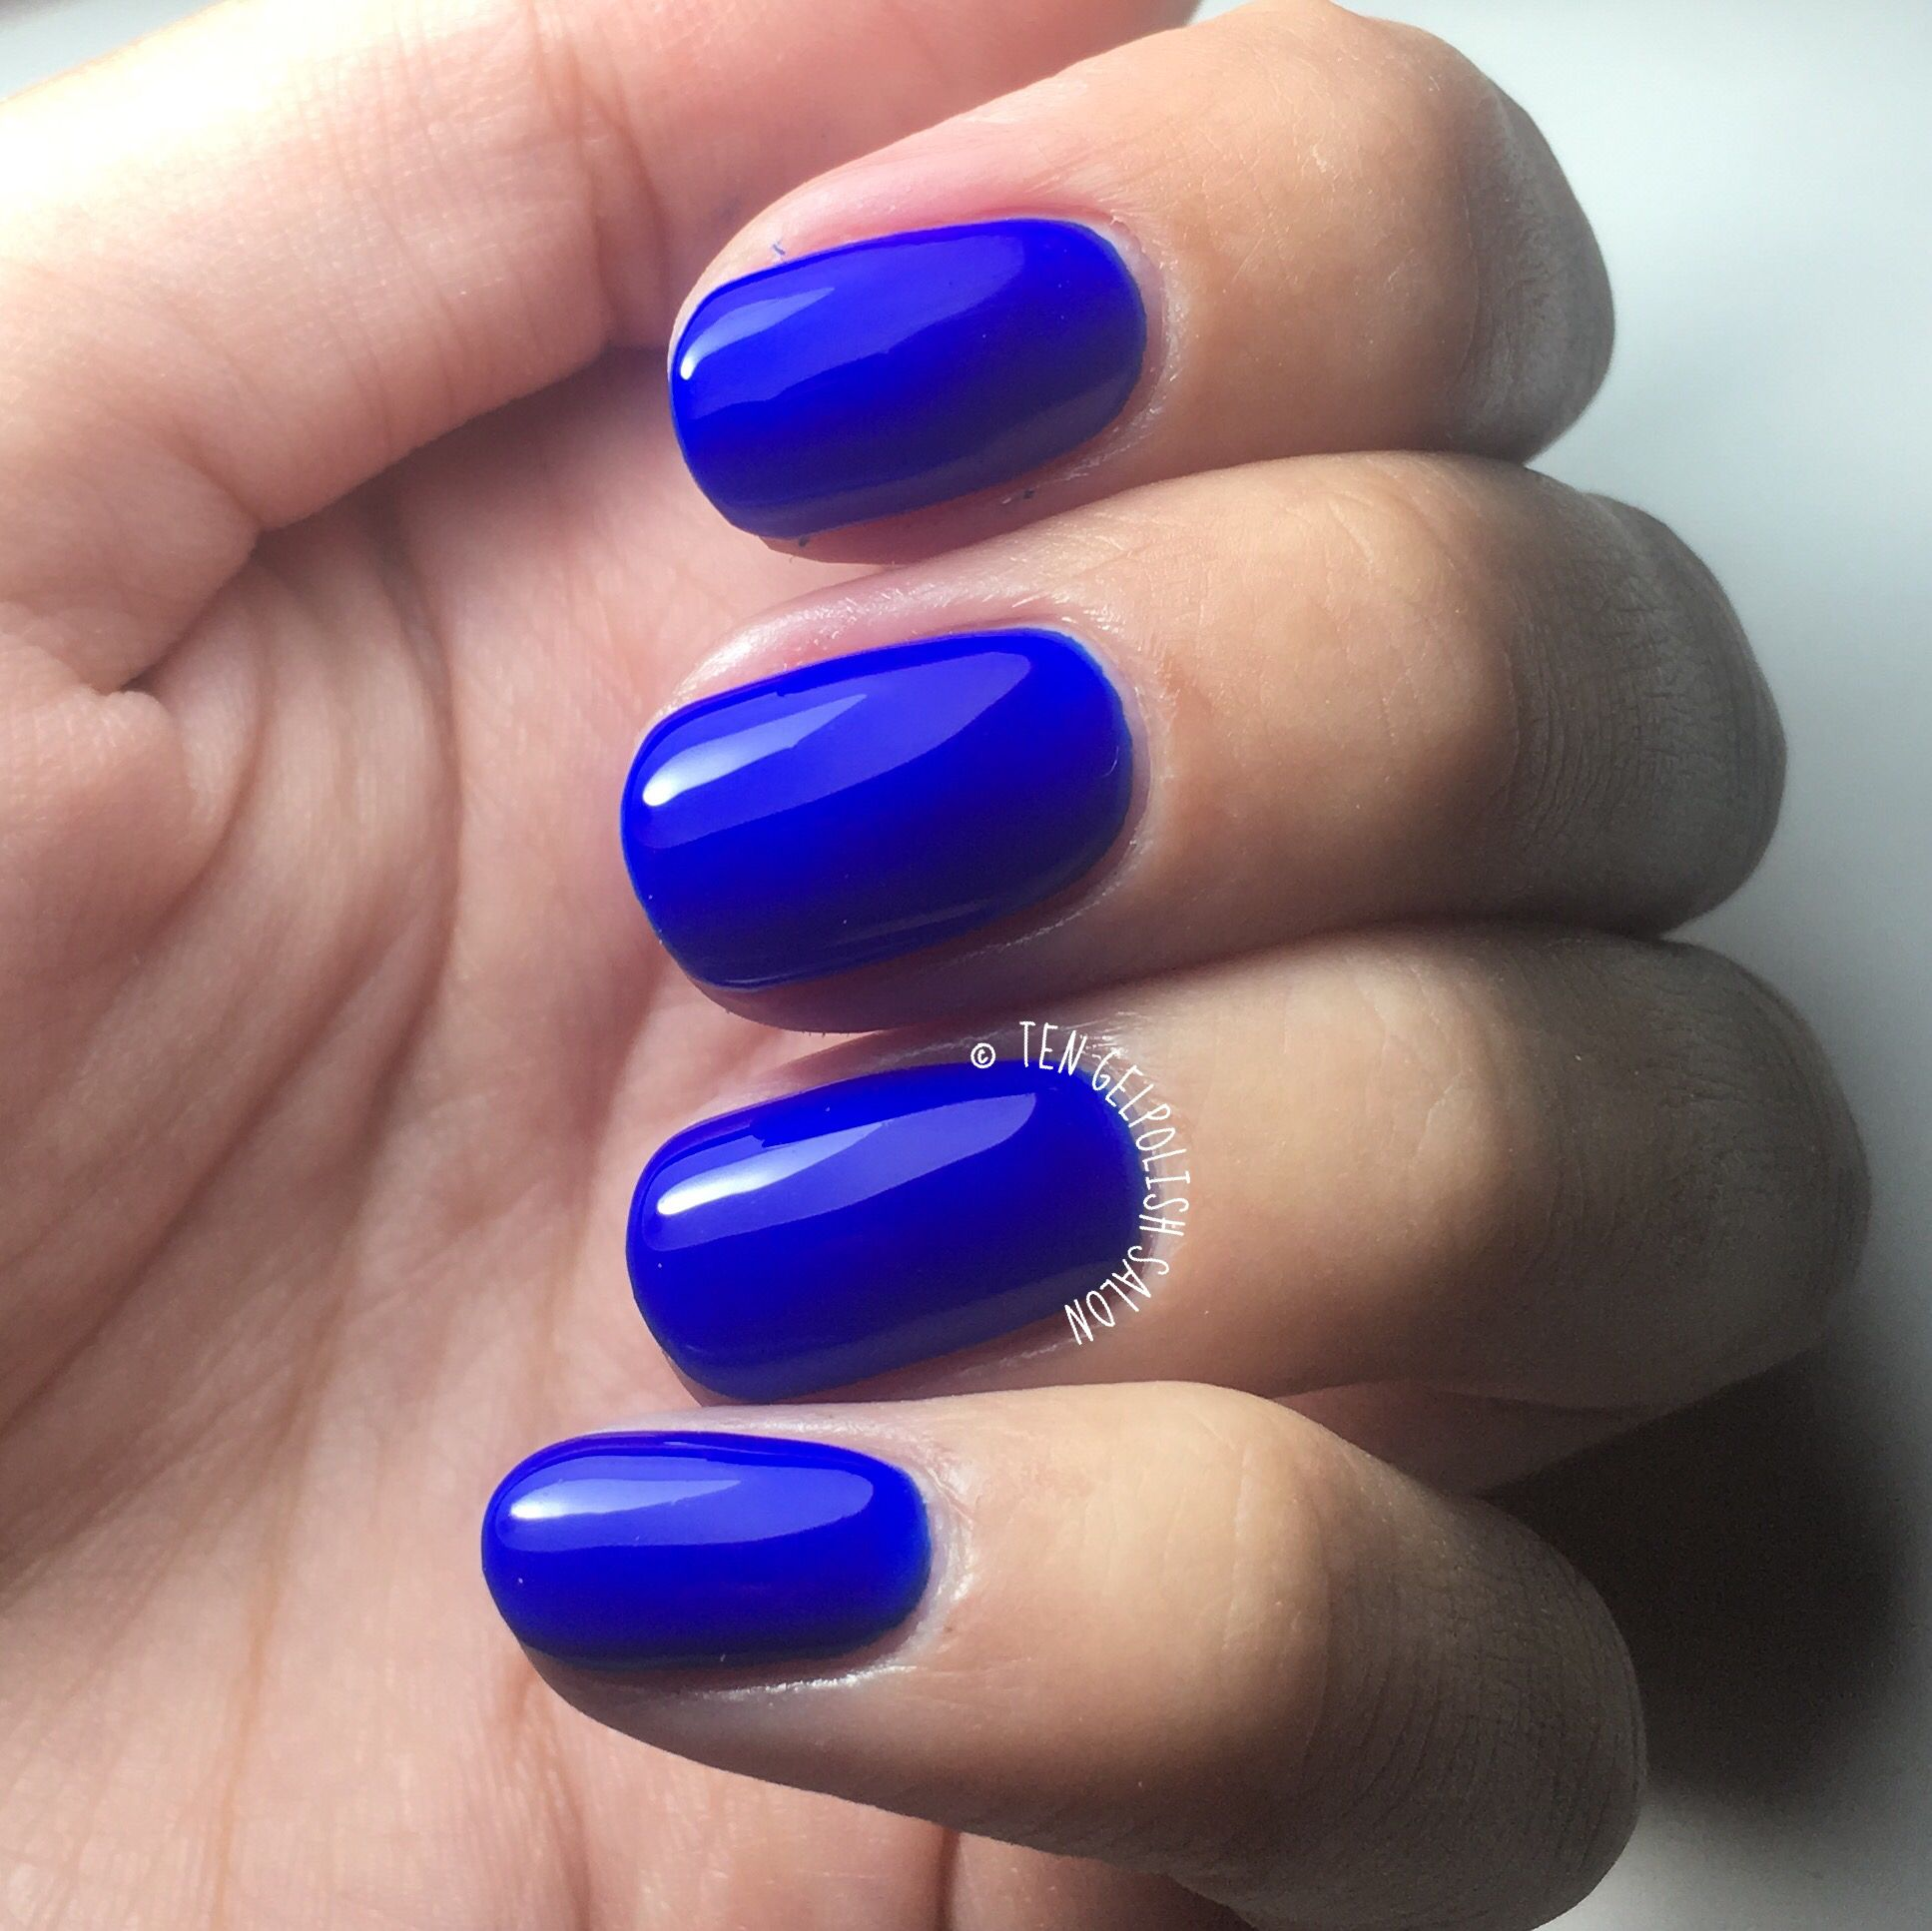 Gelpolish on natural nails - Venalisa number 939 - kingsblue ...